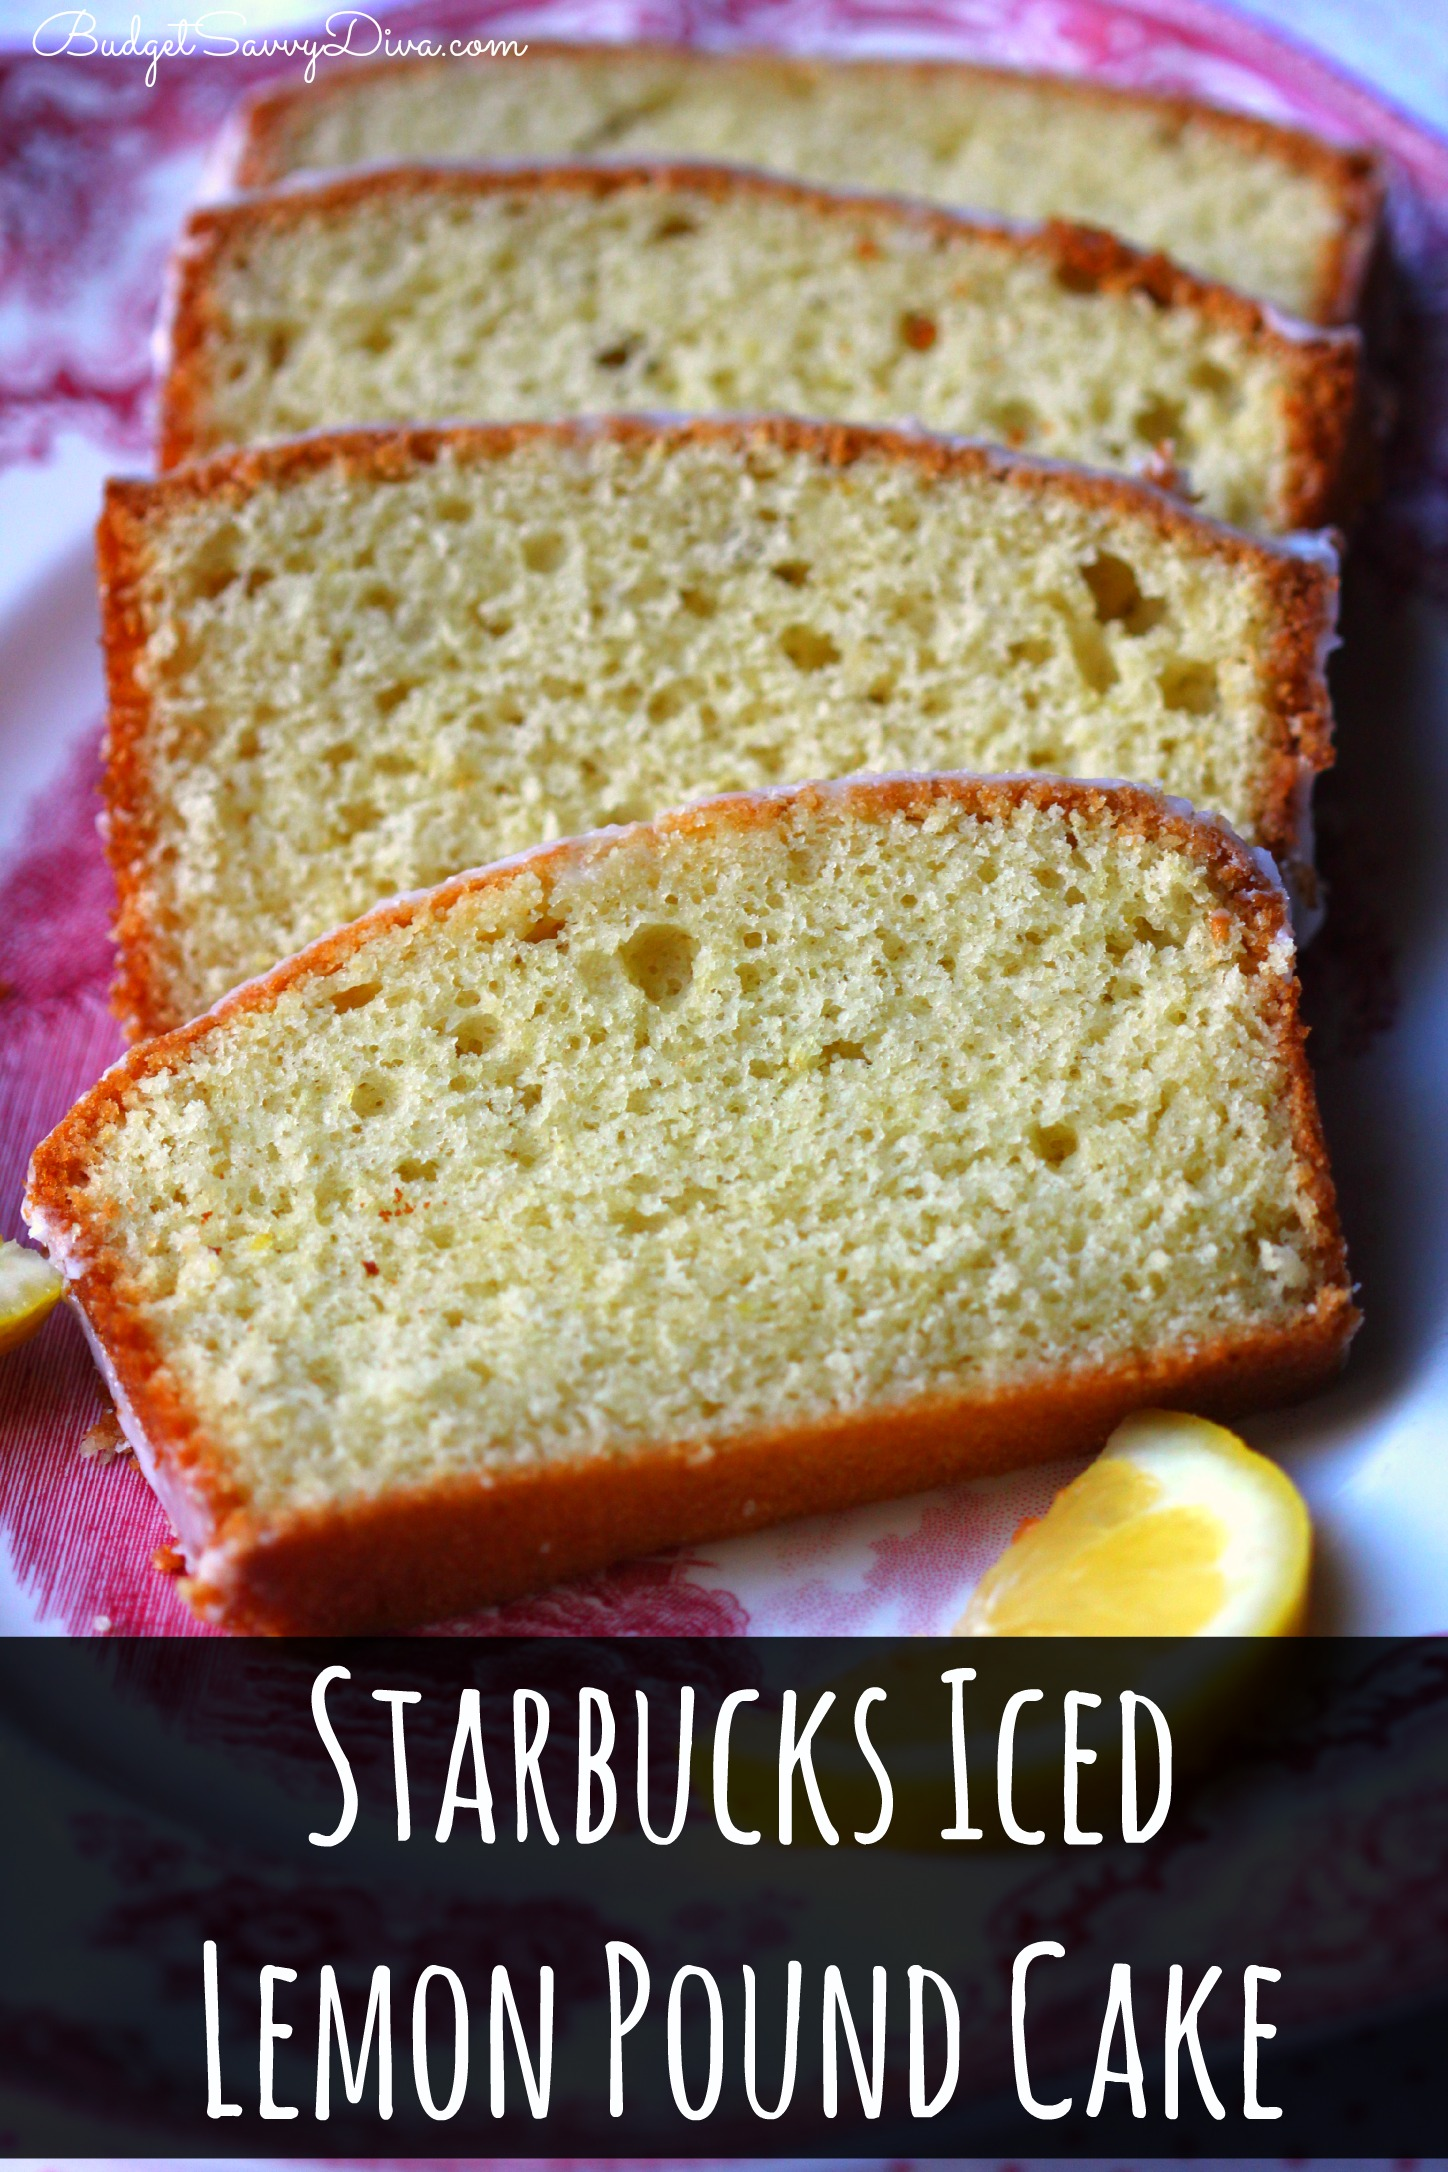 Starbucks Iced Lemon Pound Cake Recipe